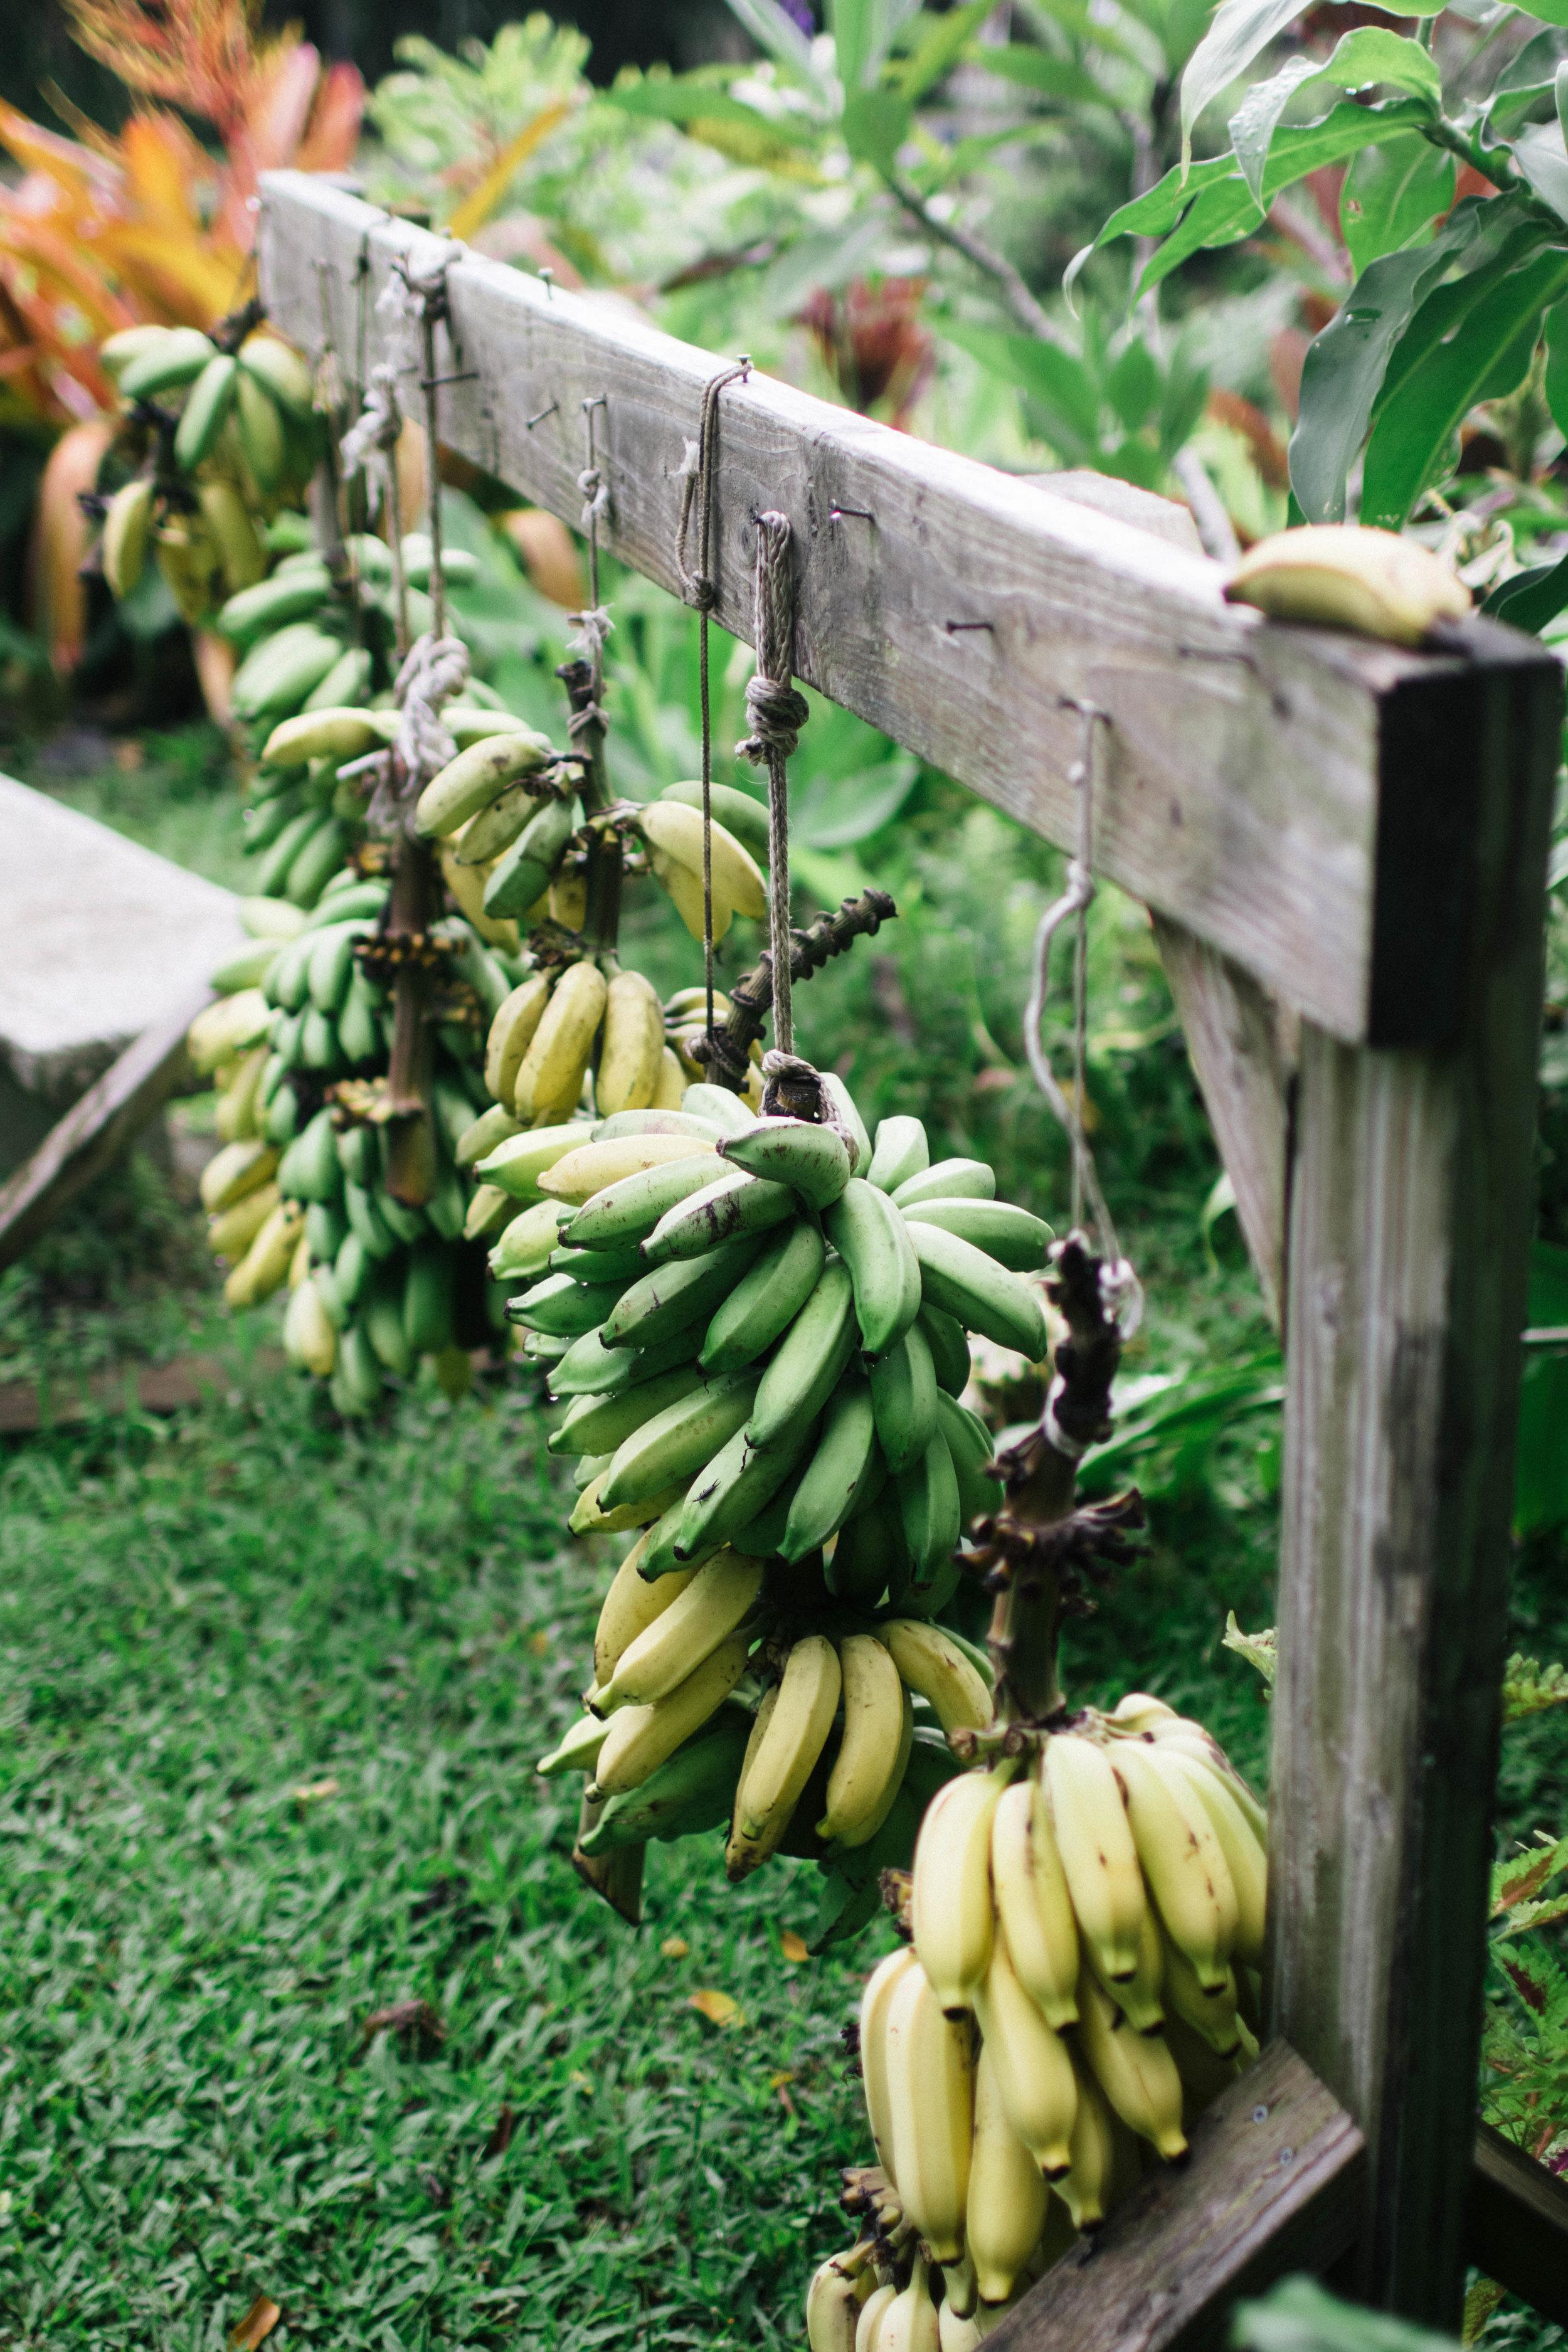 hana-farms-banana-photo-by-samantha-look.jpg